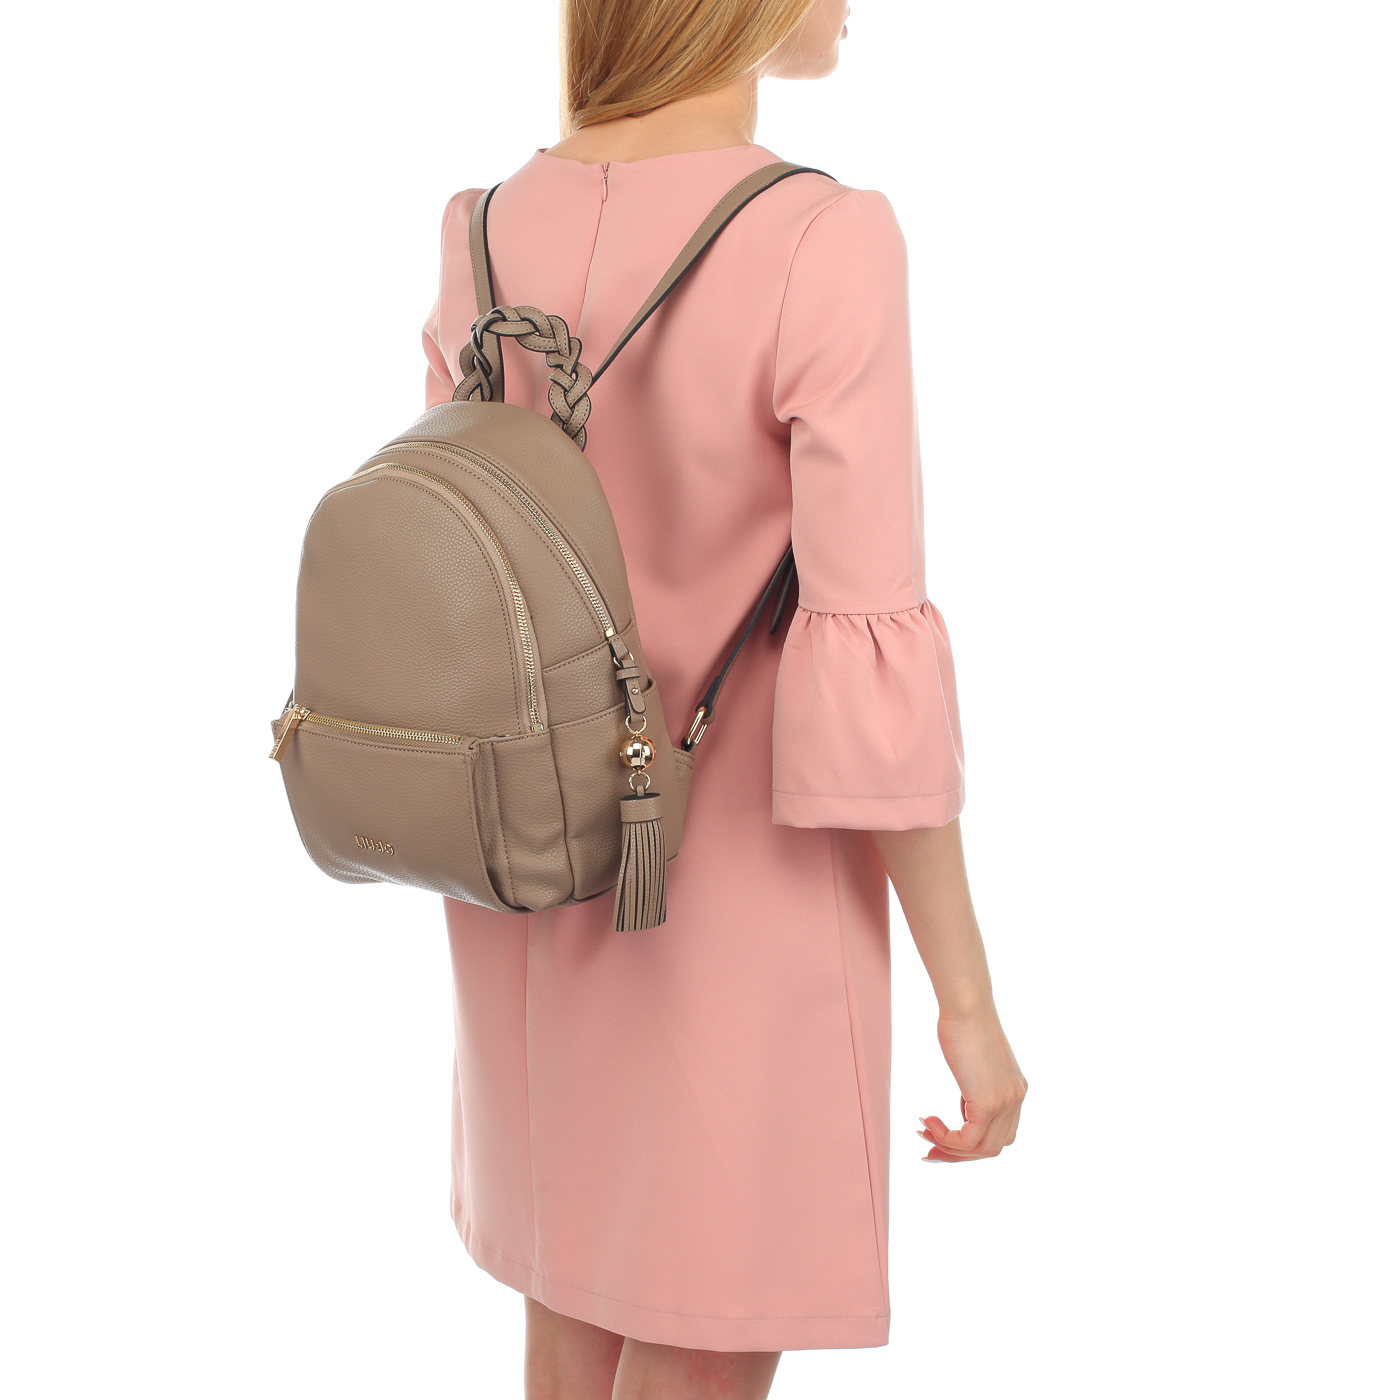 6d556c701e55 Женский рюкзак на молнии Liu Jo Arizona A18052E0086_arenaria ...